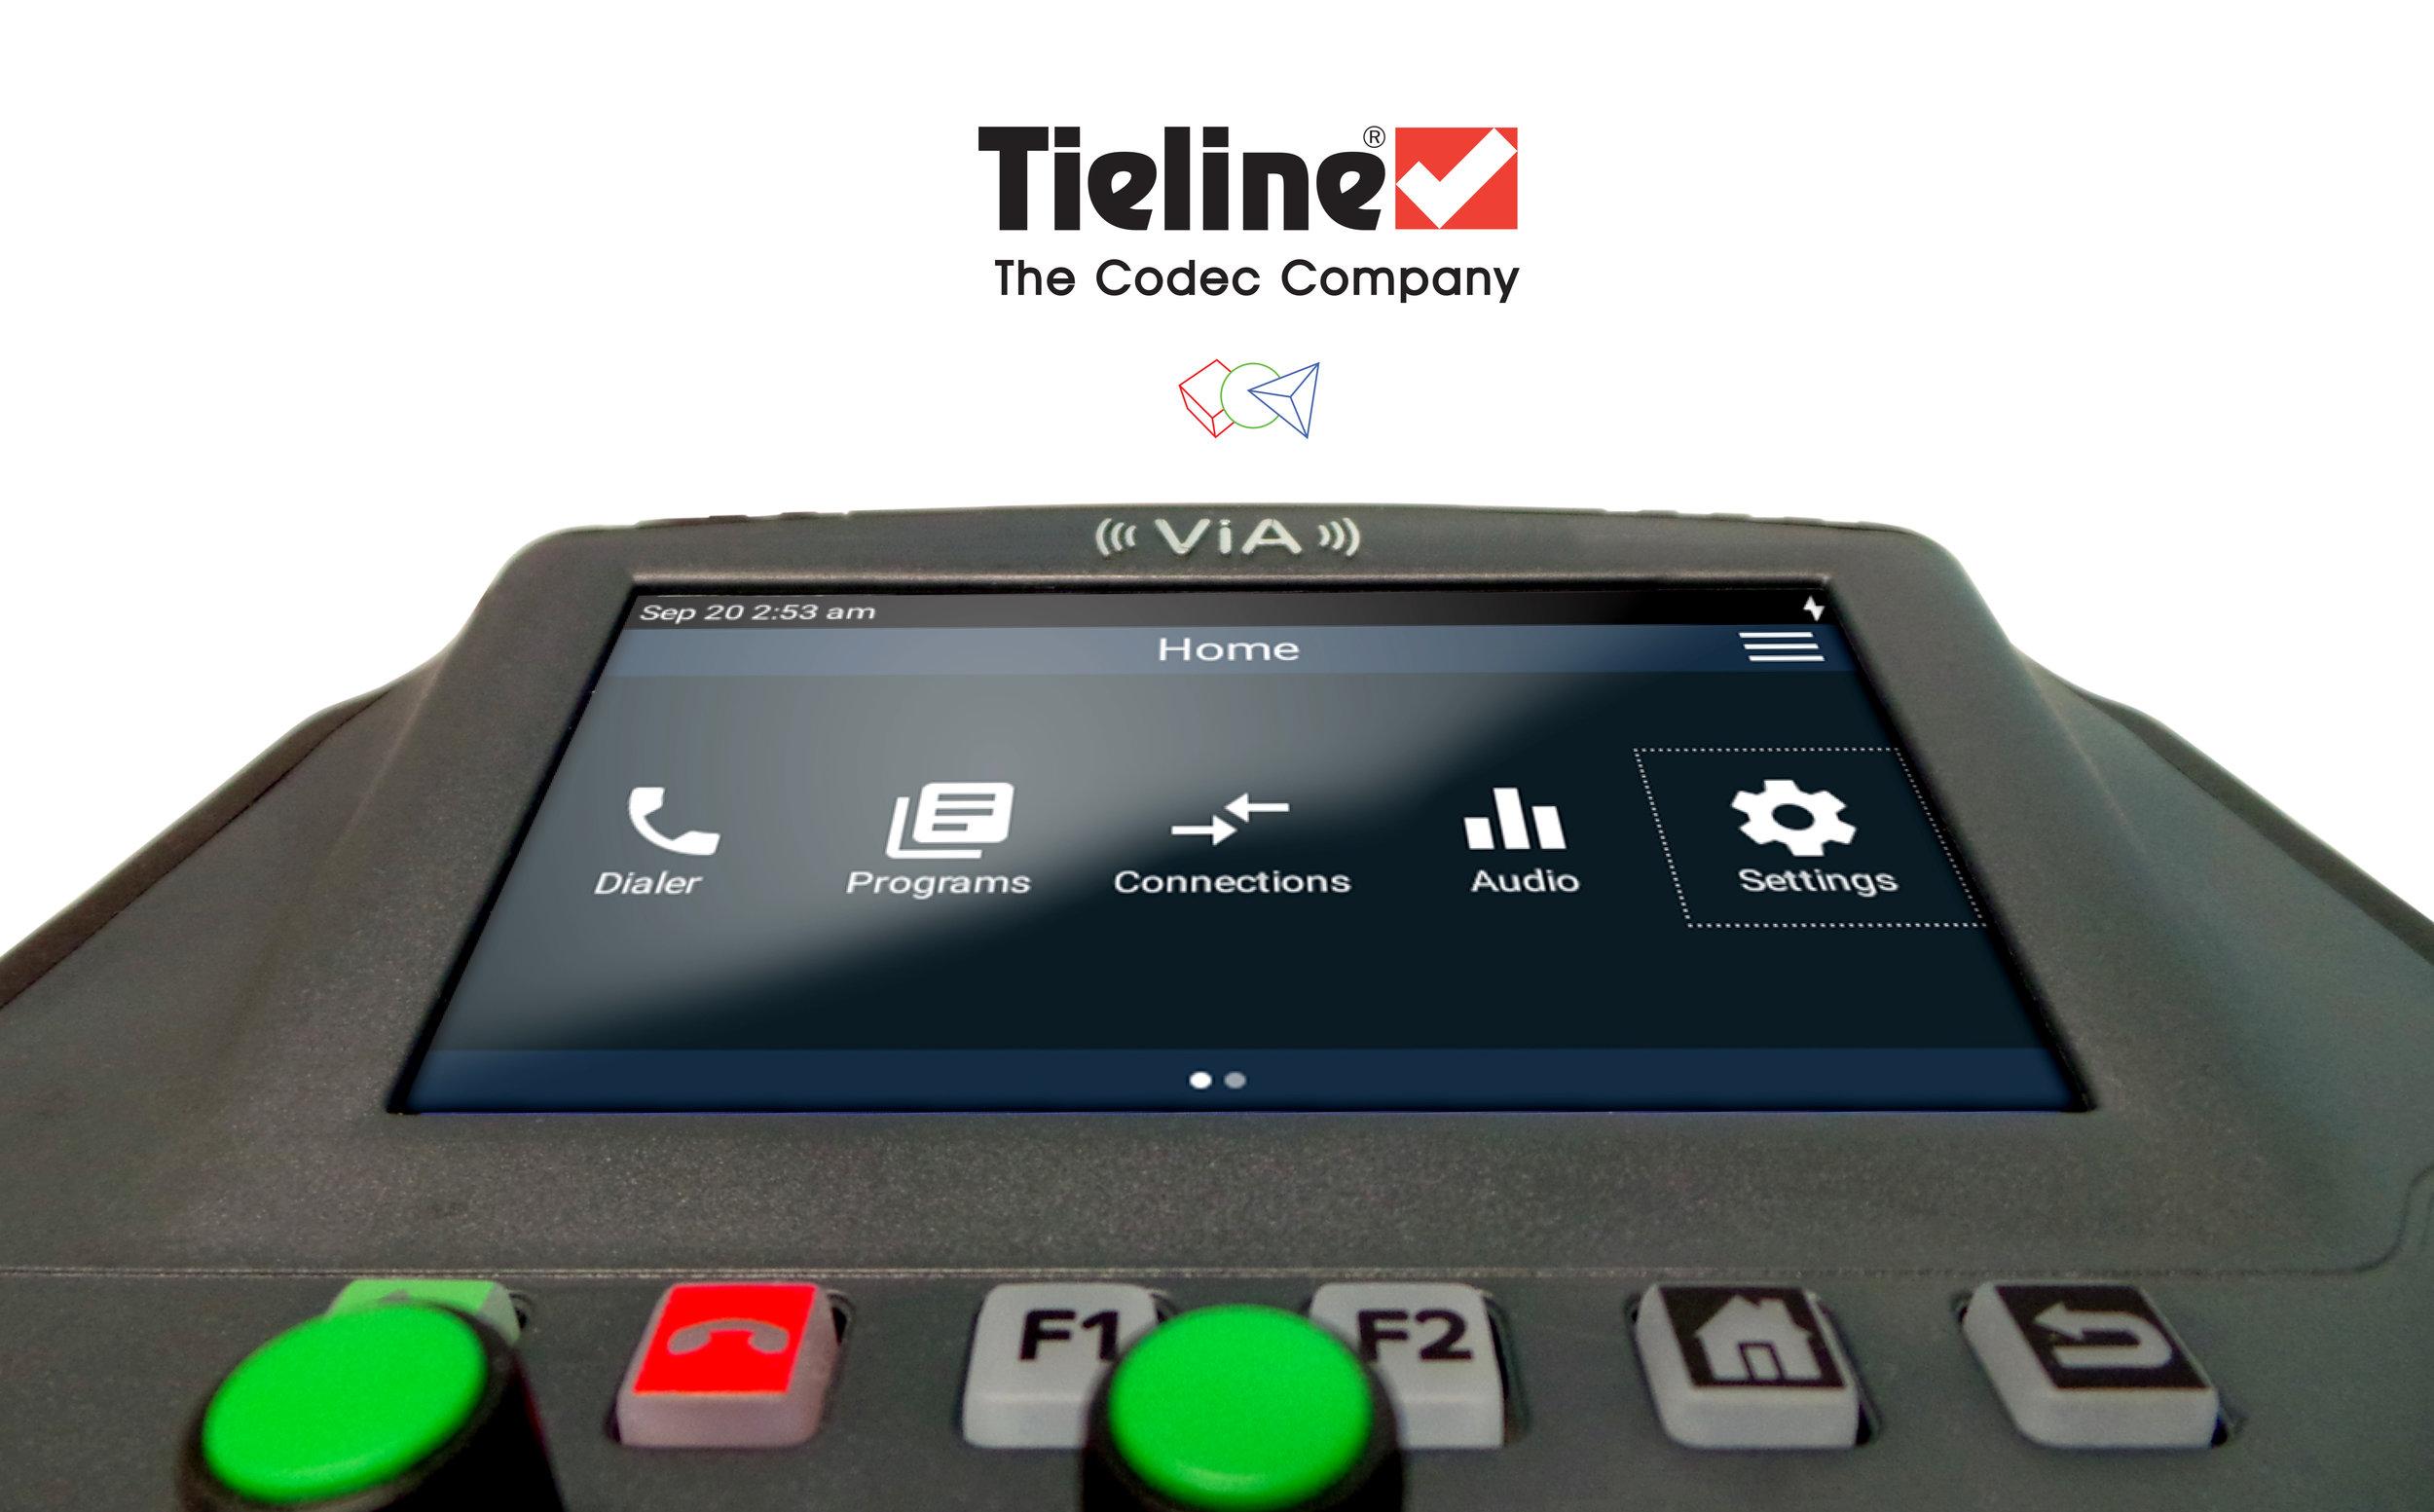 Tieline_4.jpg